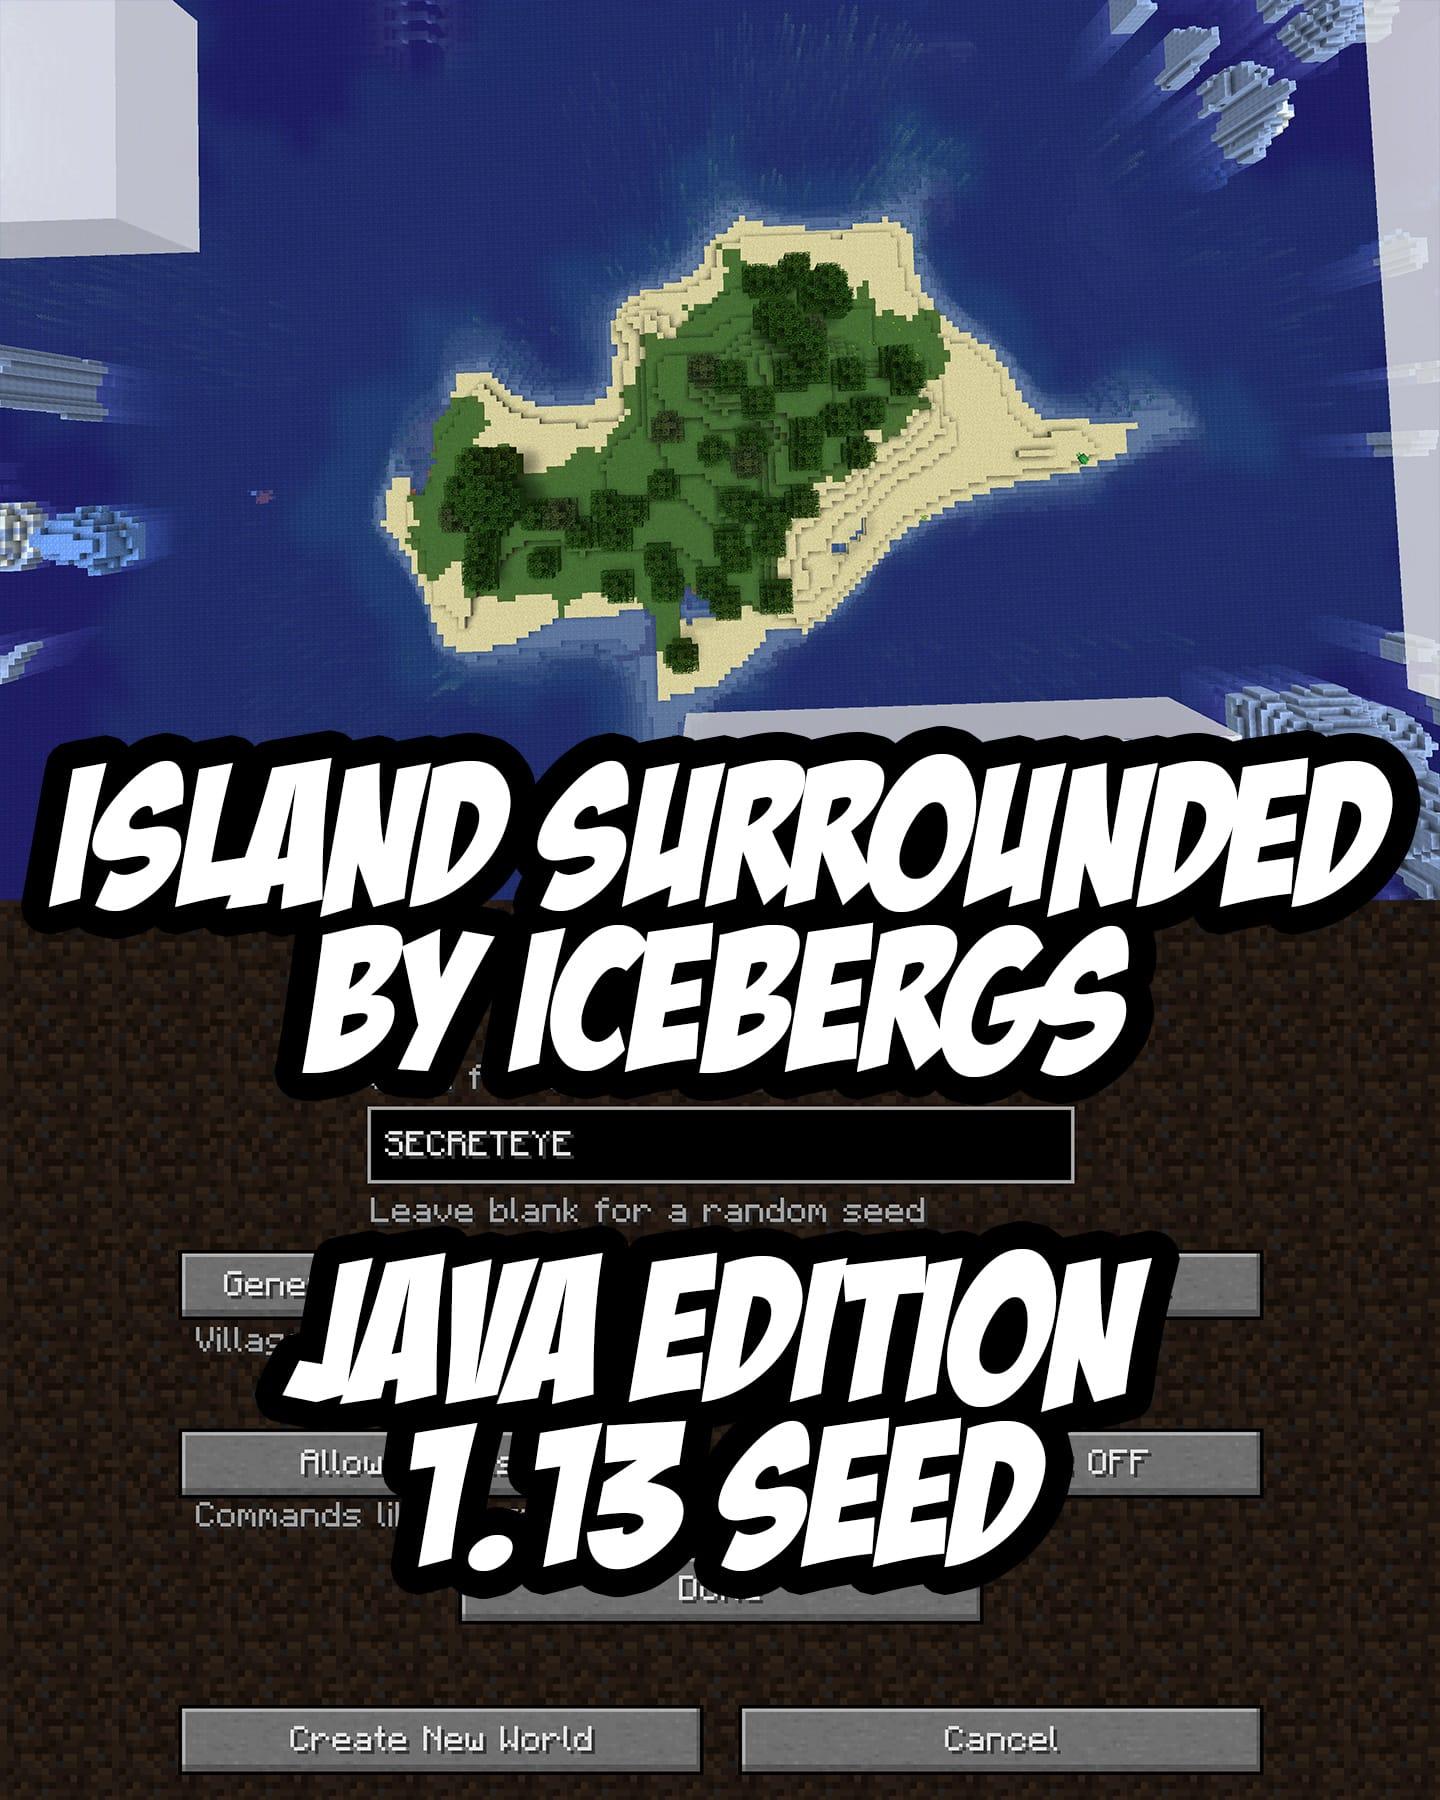 Java Edition 1.13+ /// Seed: SECRETEYE